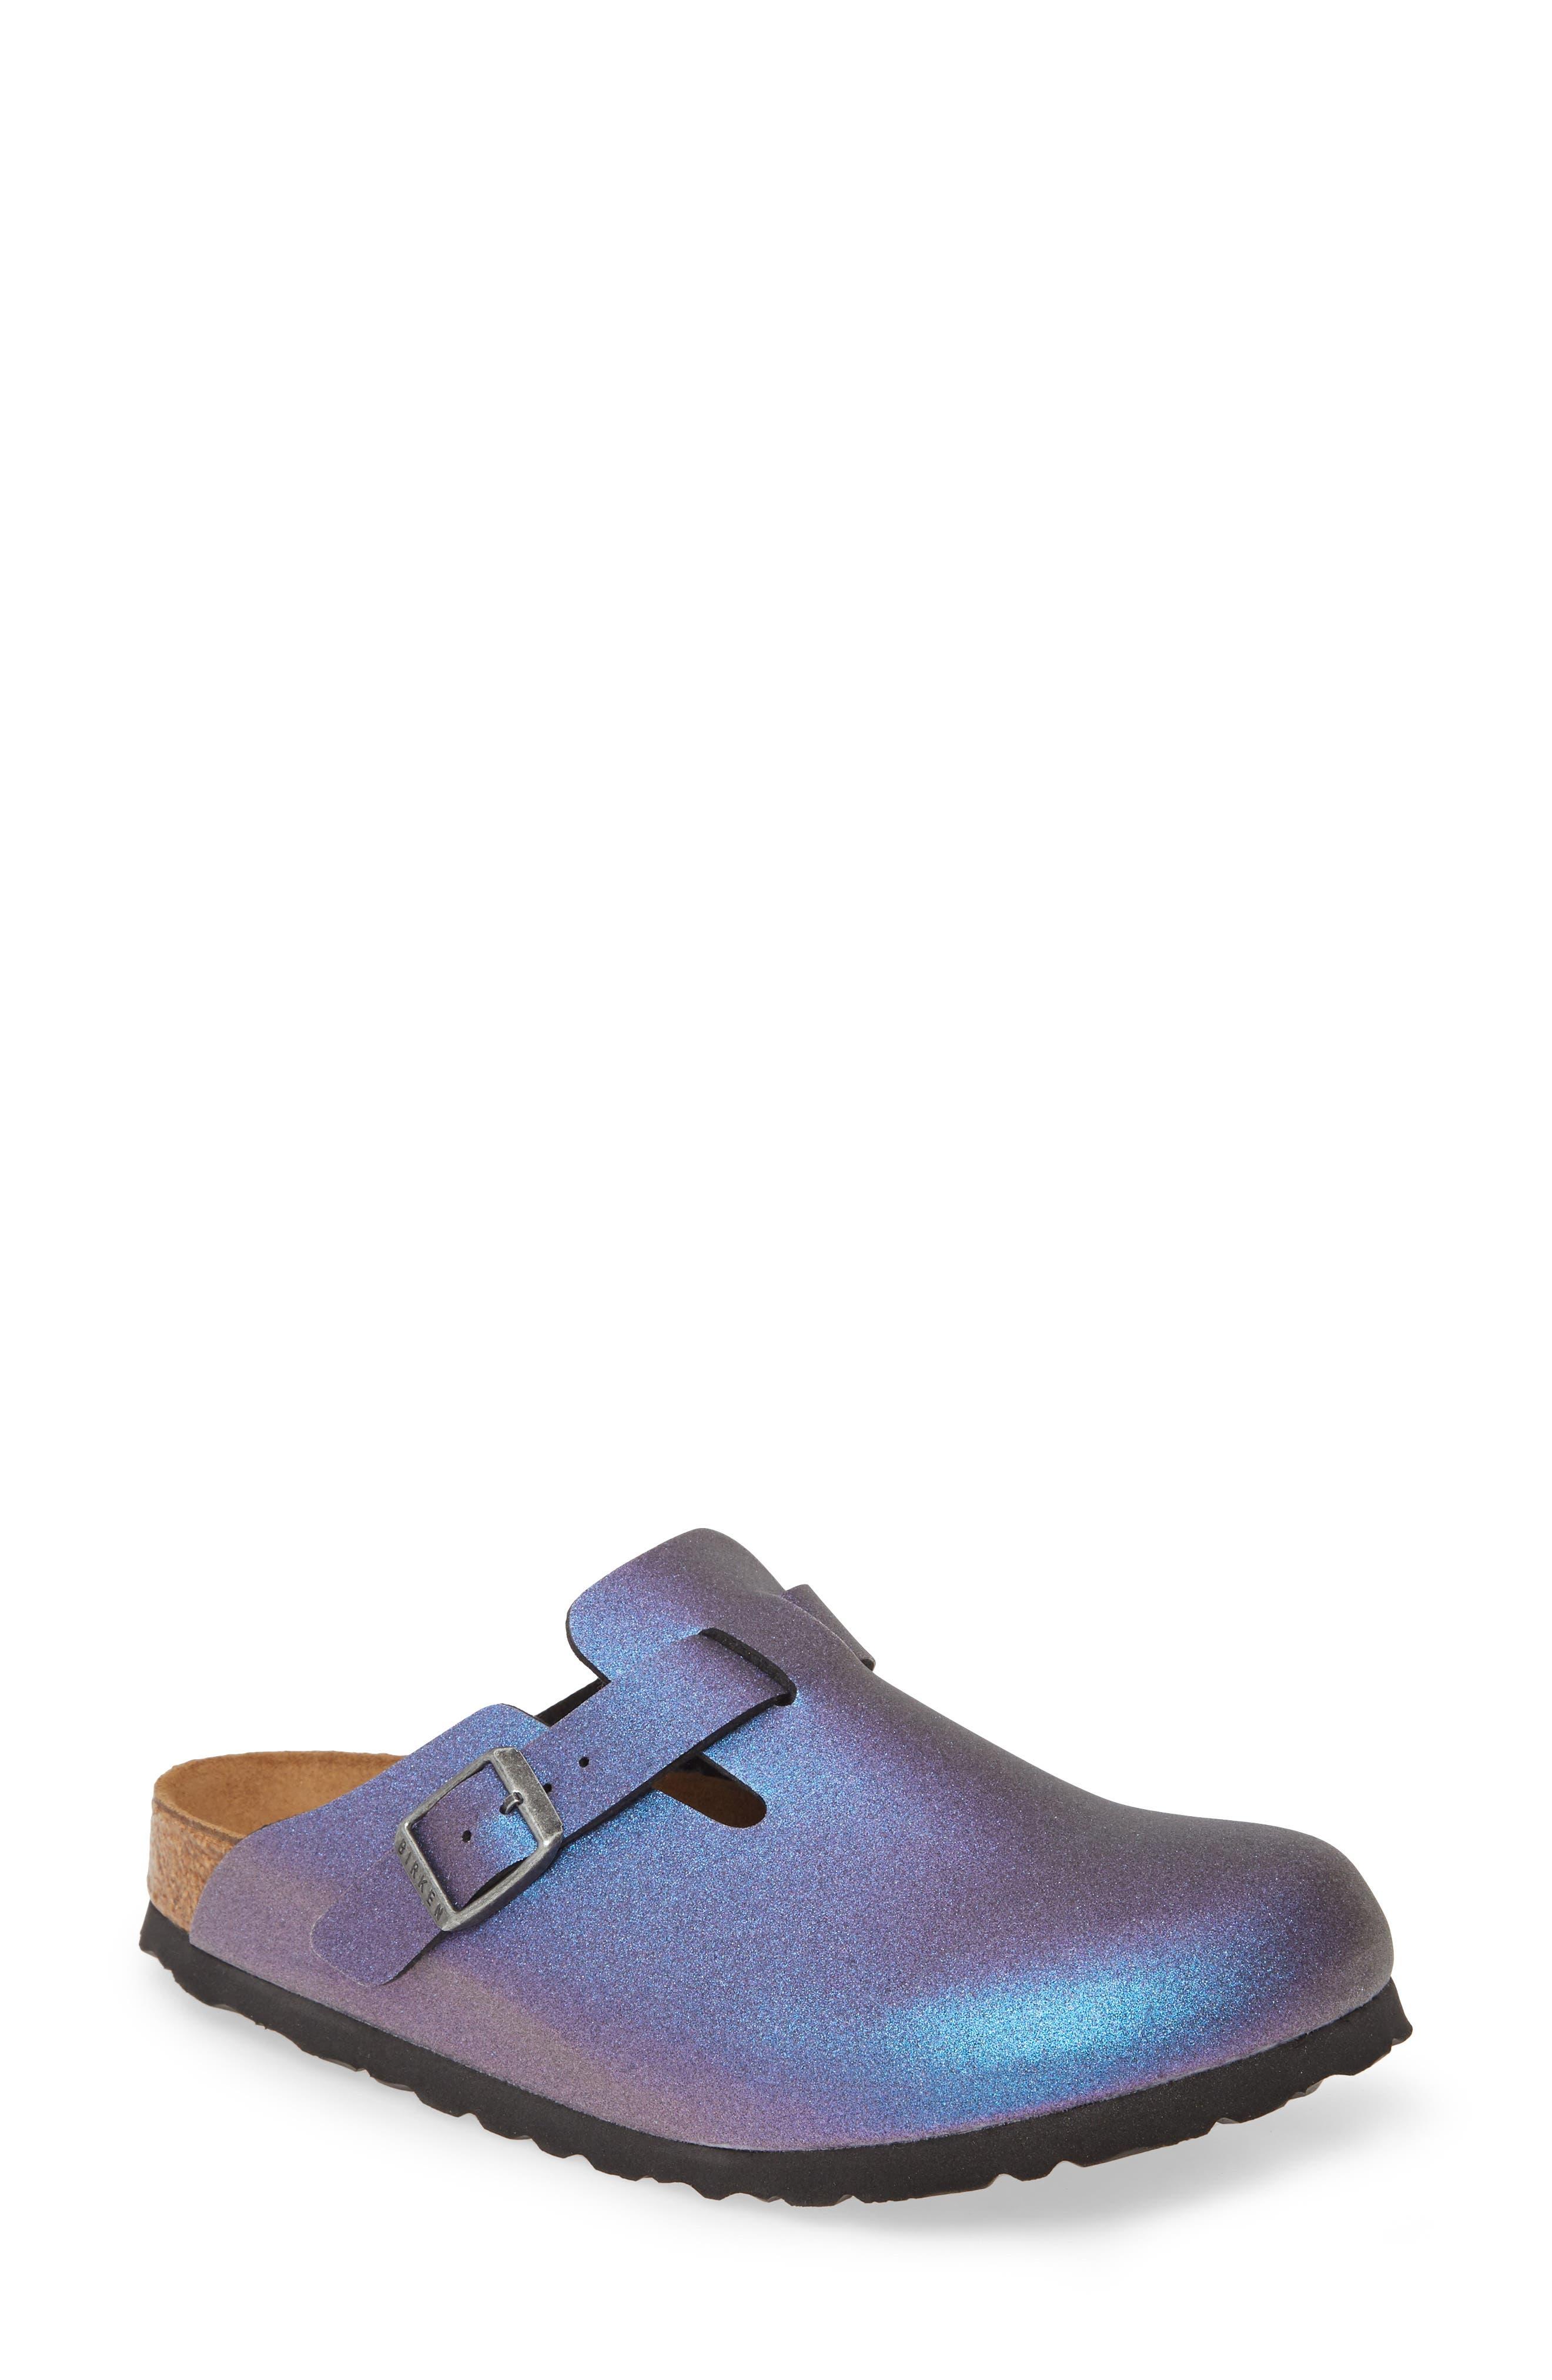 Birkenstock Boston Metallic Clog,8.5 B - Blue